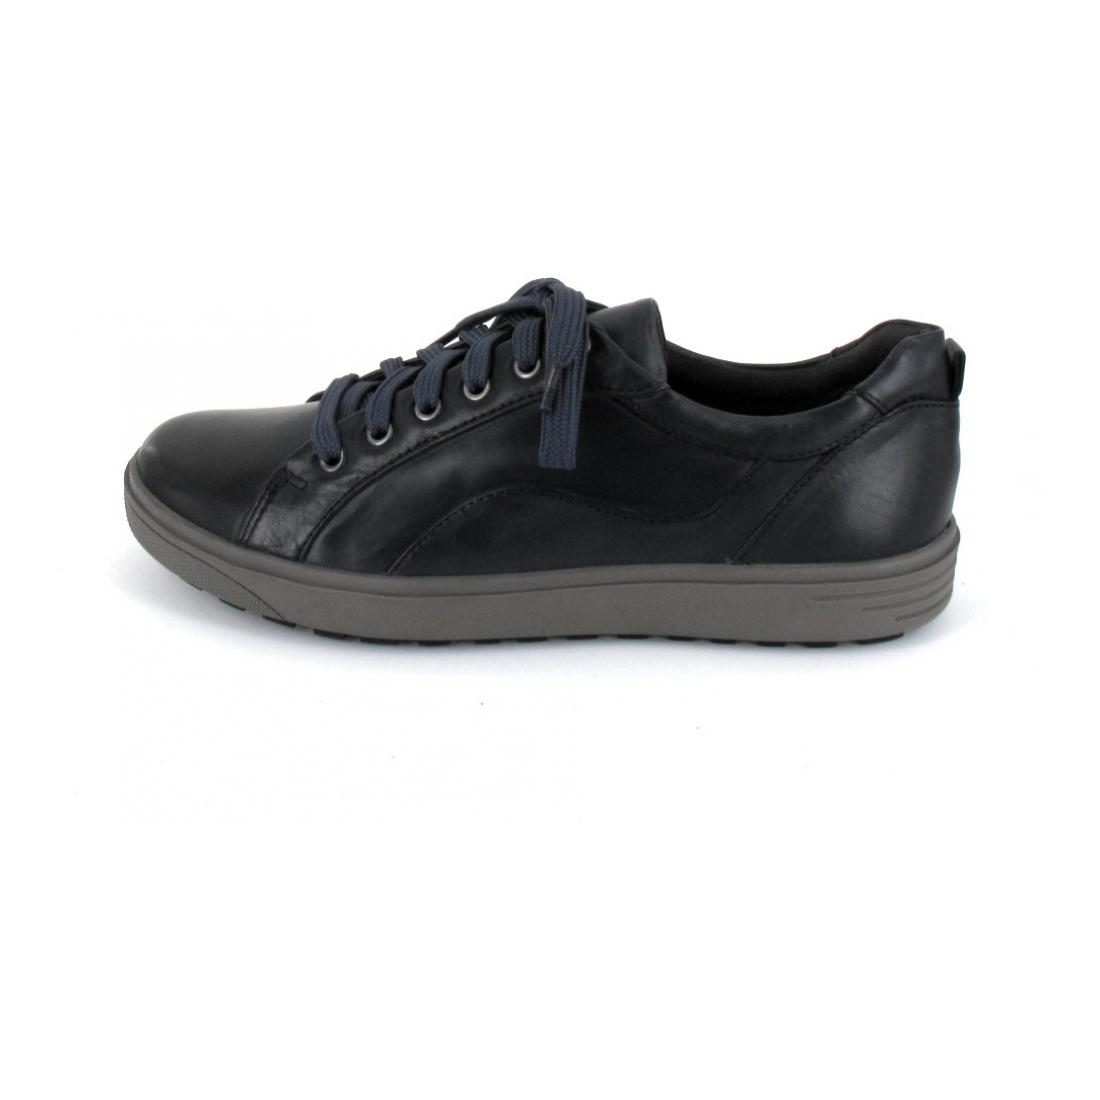 sports shoes 63550 ef330 Jana Schnürer | Schuh-Welt - Wo Markenschuhe günstig sind